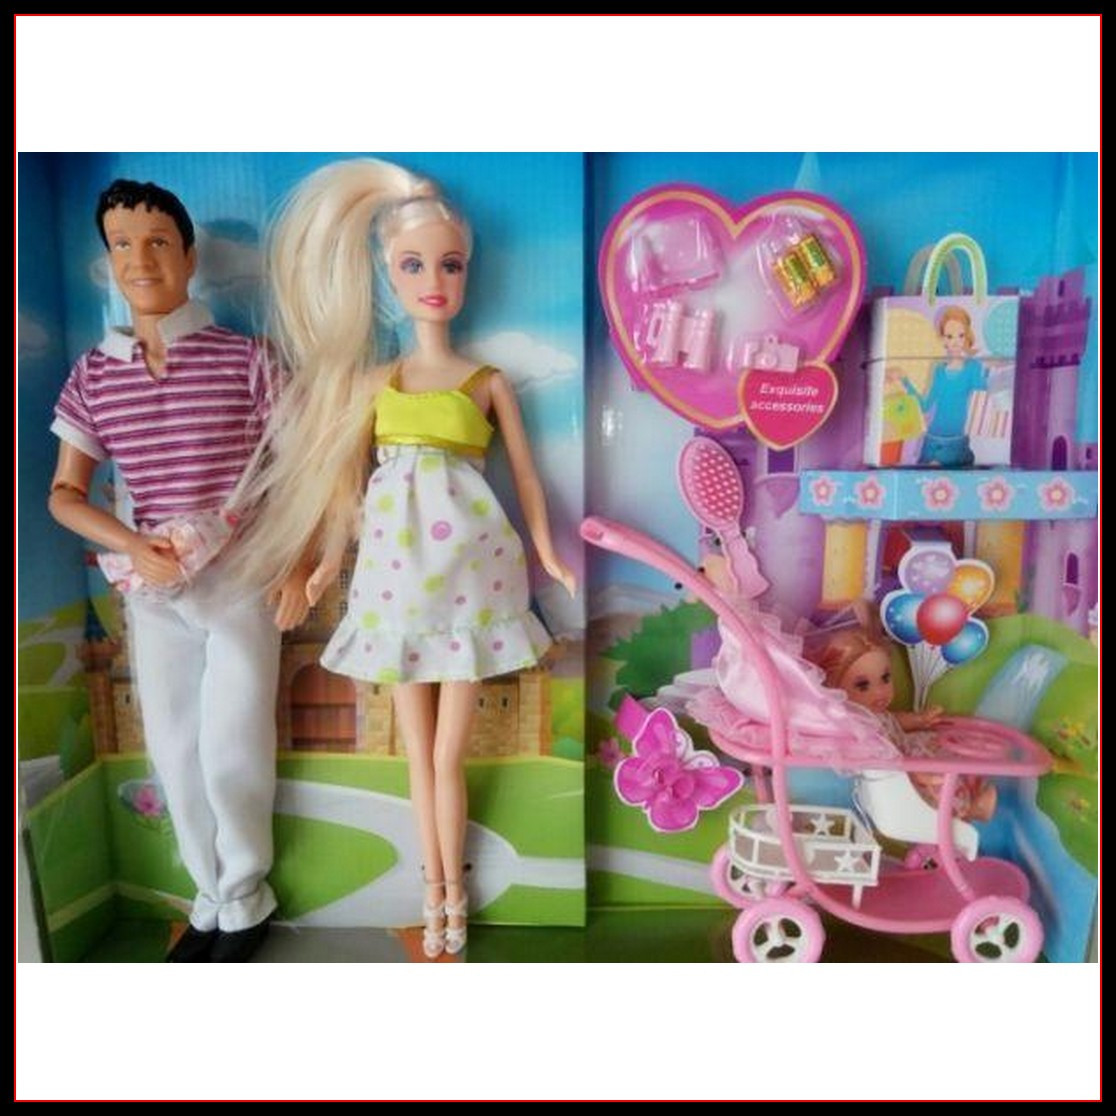 Семья кукол: беременная кукла-мама, кукла-папа, 2 ребенка, аксессуары DEFA 8088